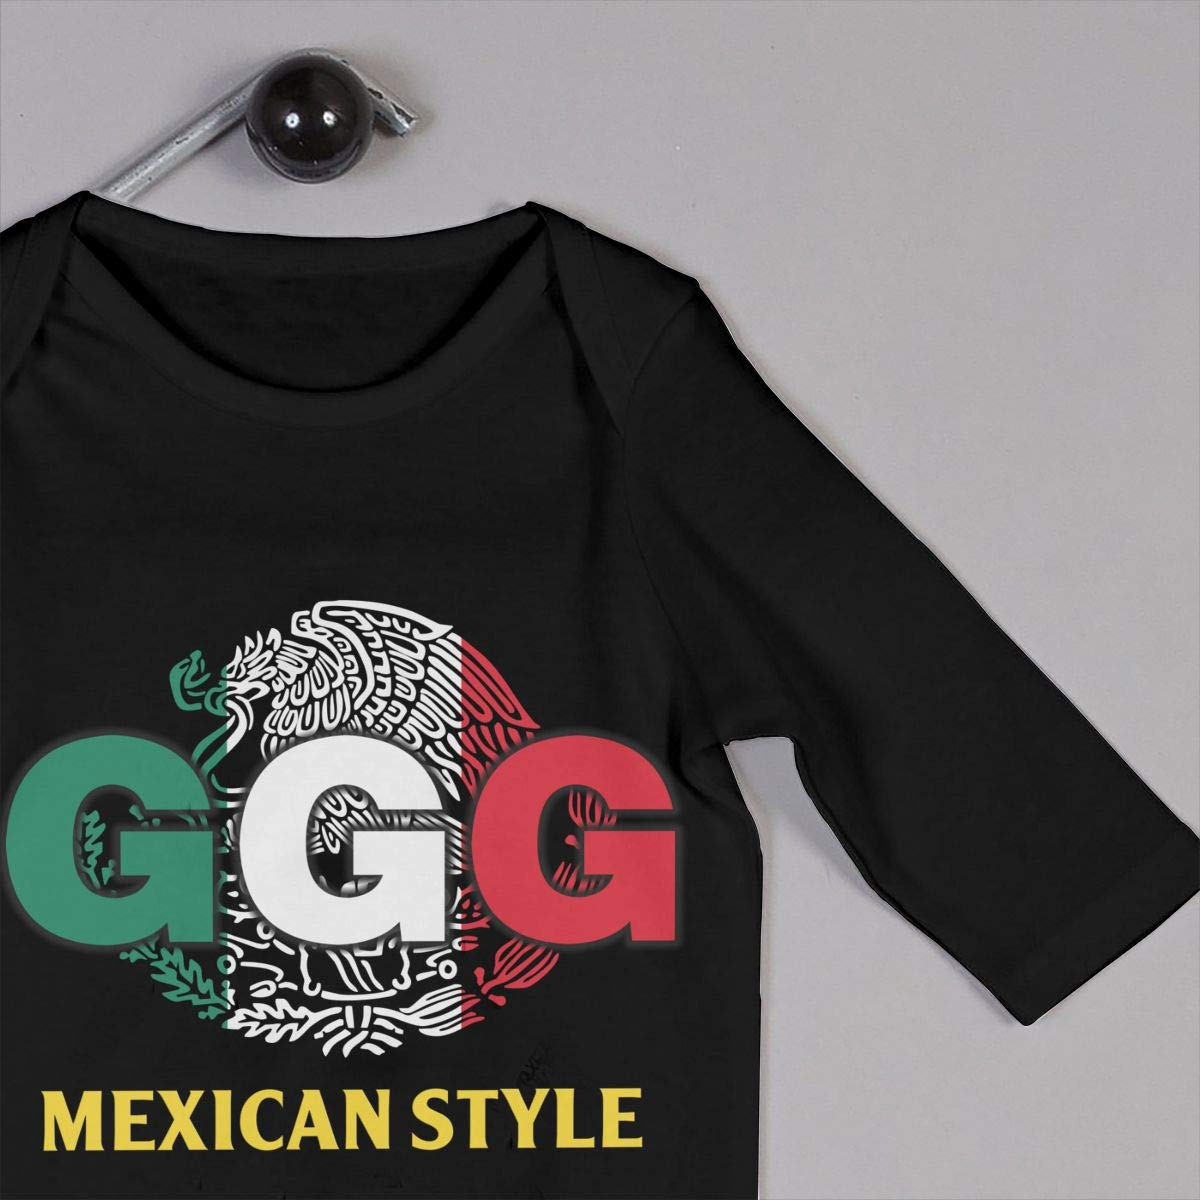 Estilo Mexicano GGG Gennady Golovkin Boxeo Niña Niño Bebé Manga Larga Bebé Niño Niño Camisetas(12M, Negro): Amazon.es: Ropa y accesorios